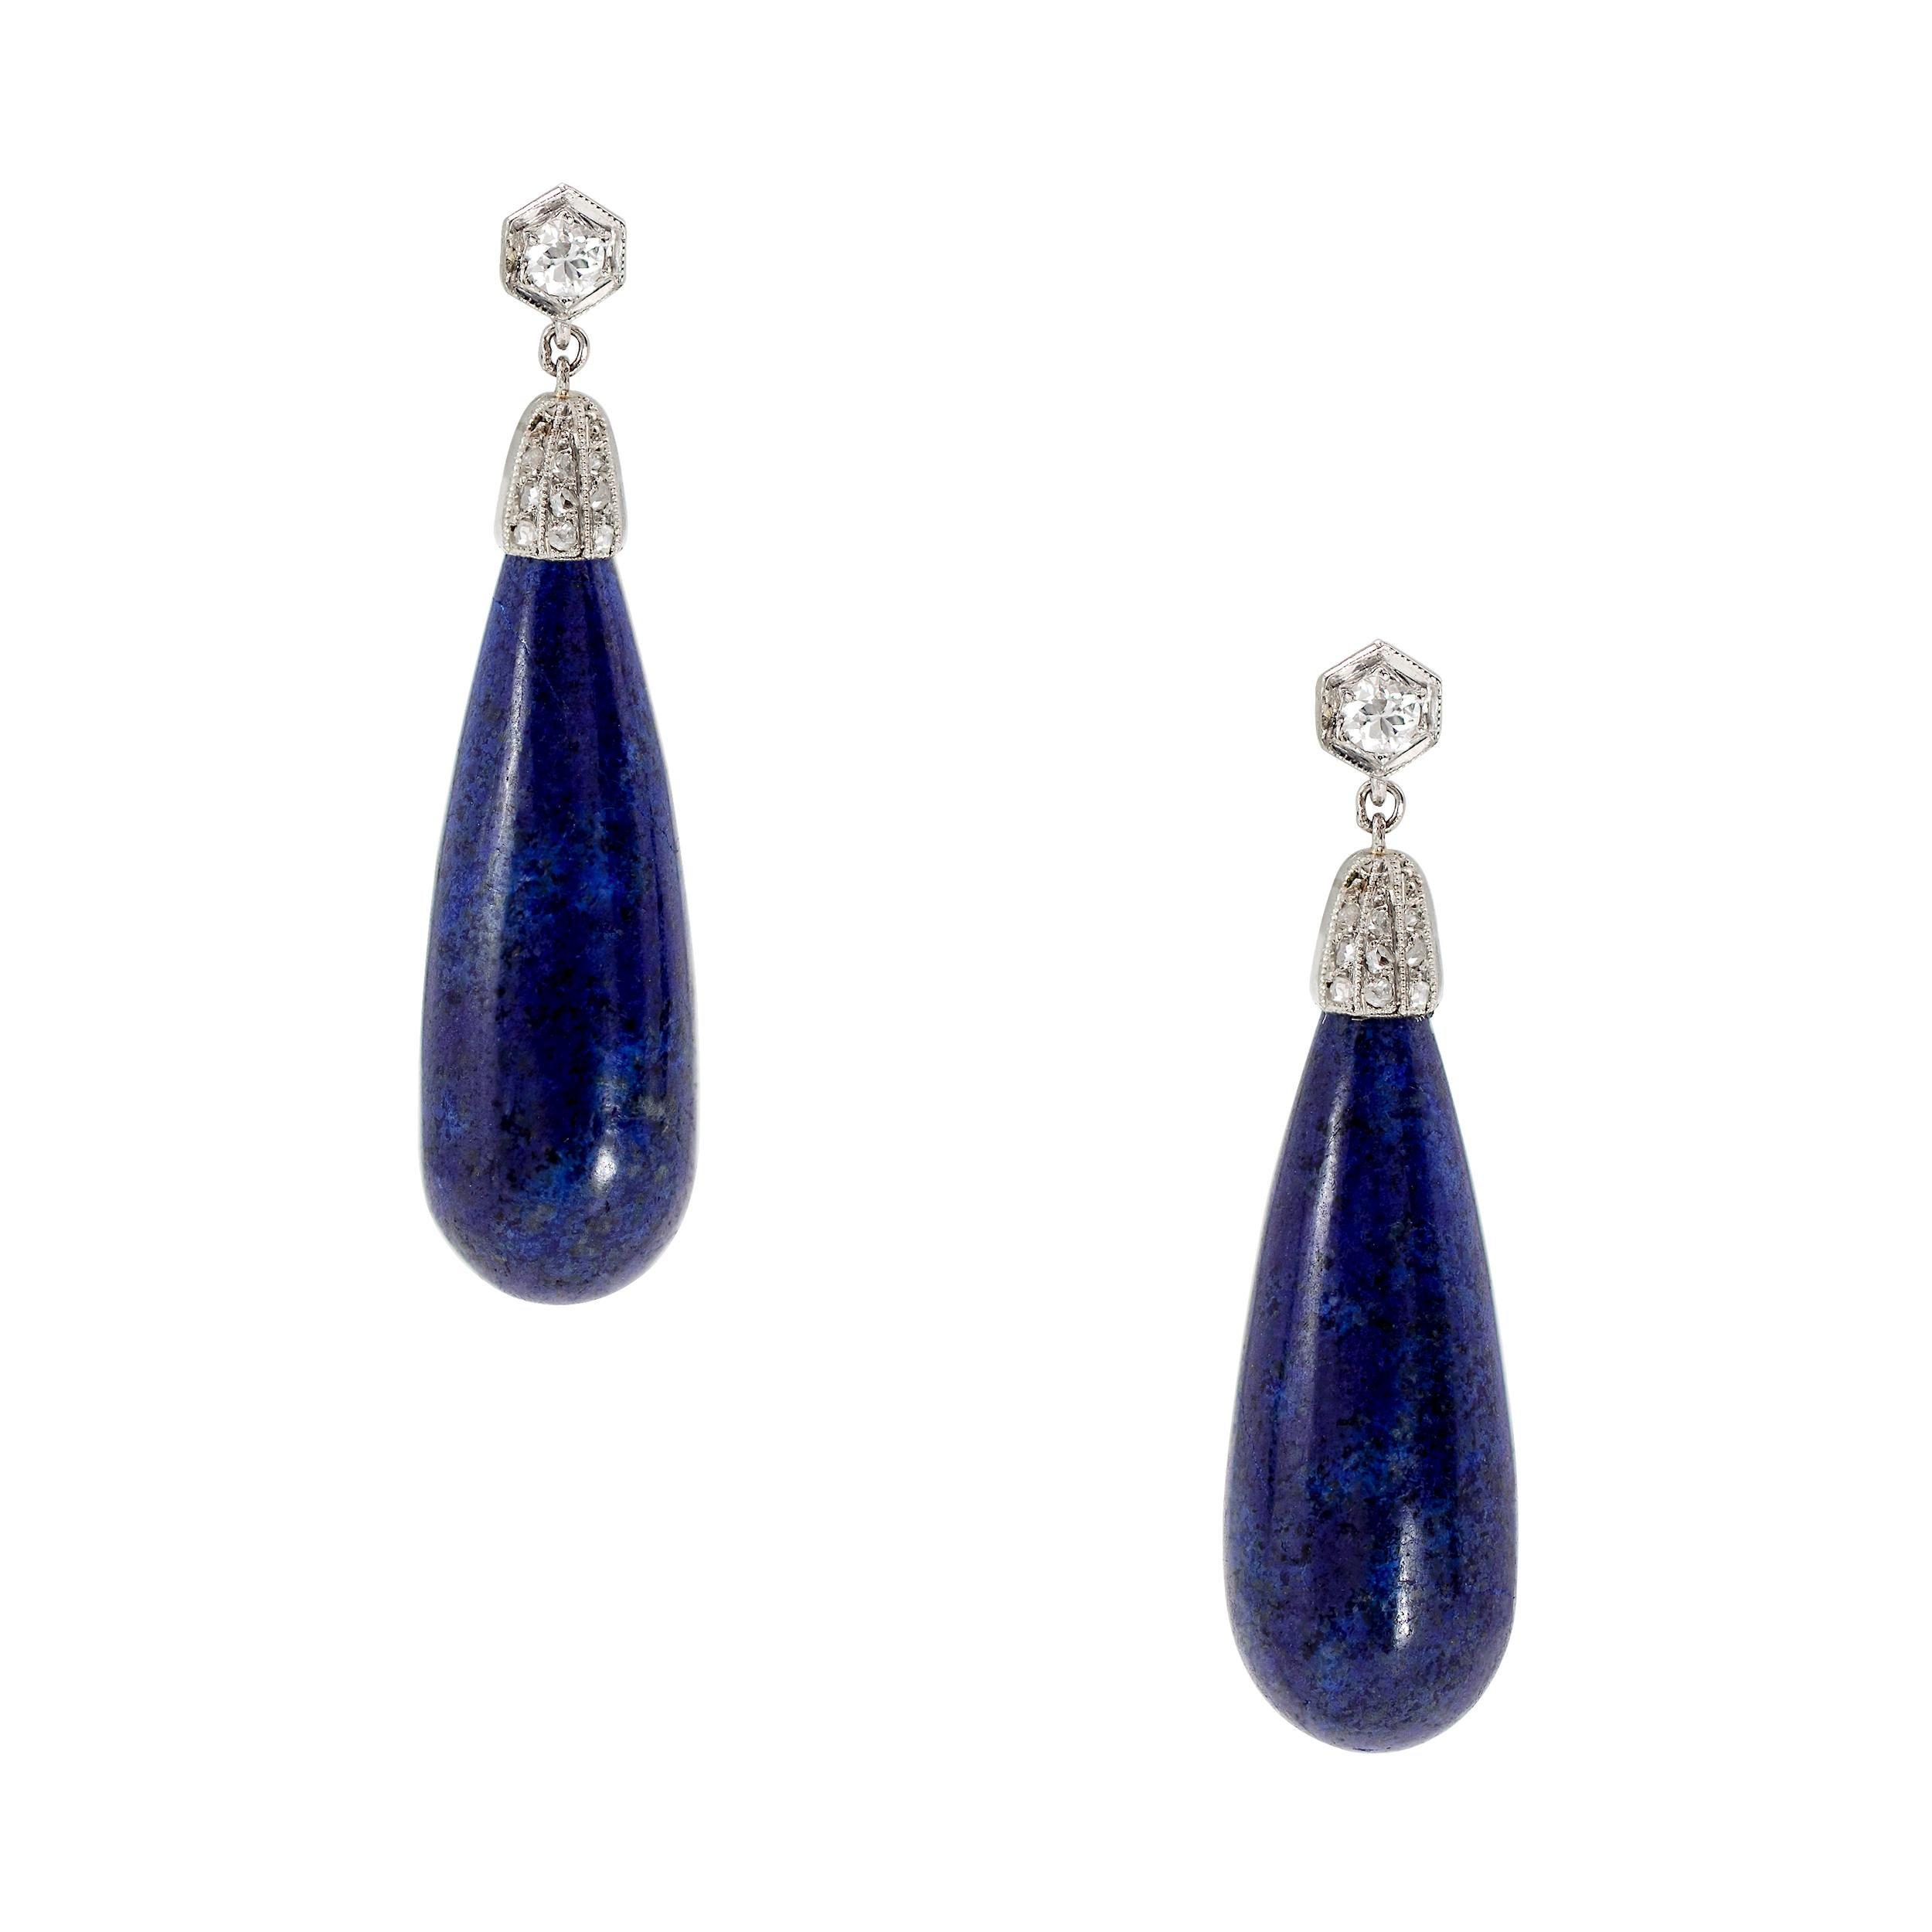 Art Deco Lapis and Diamond Drop Earrings in Platinum